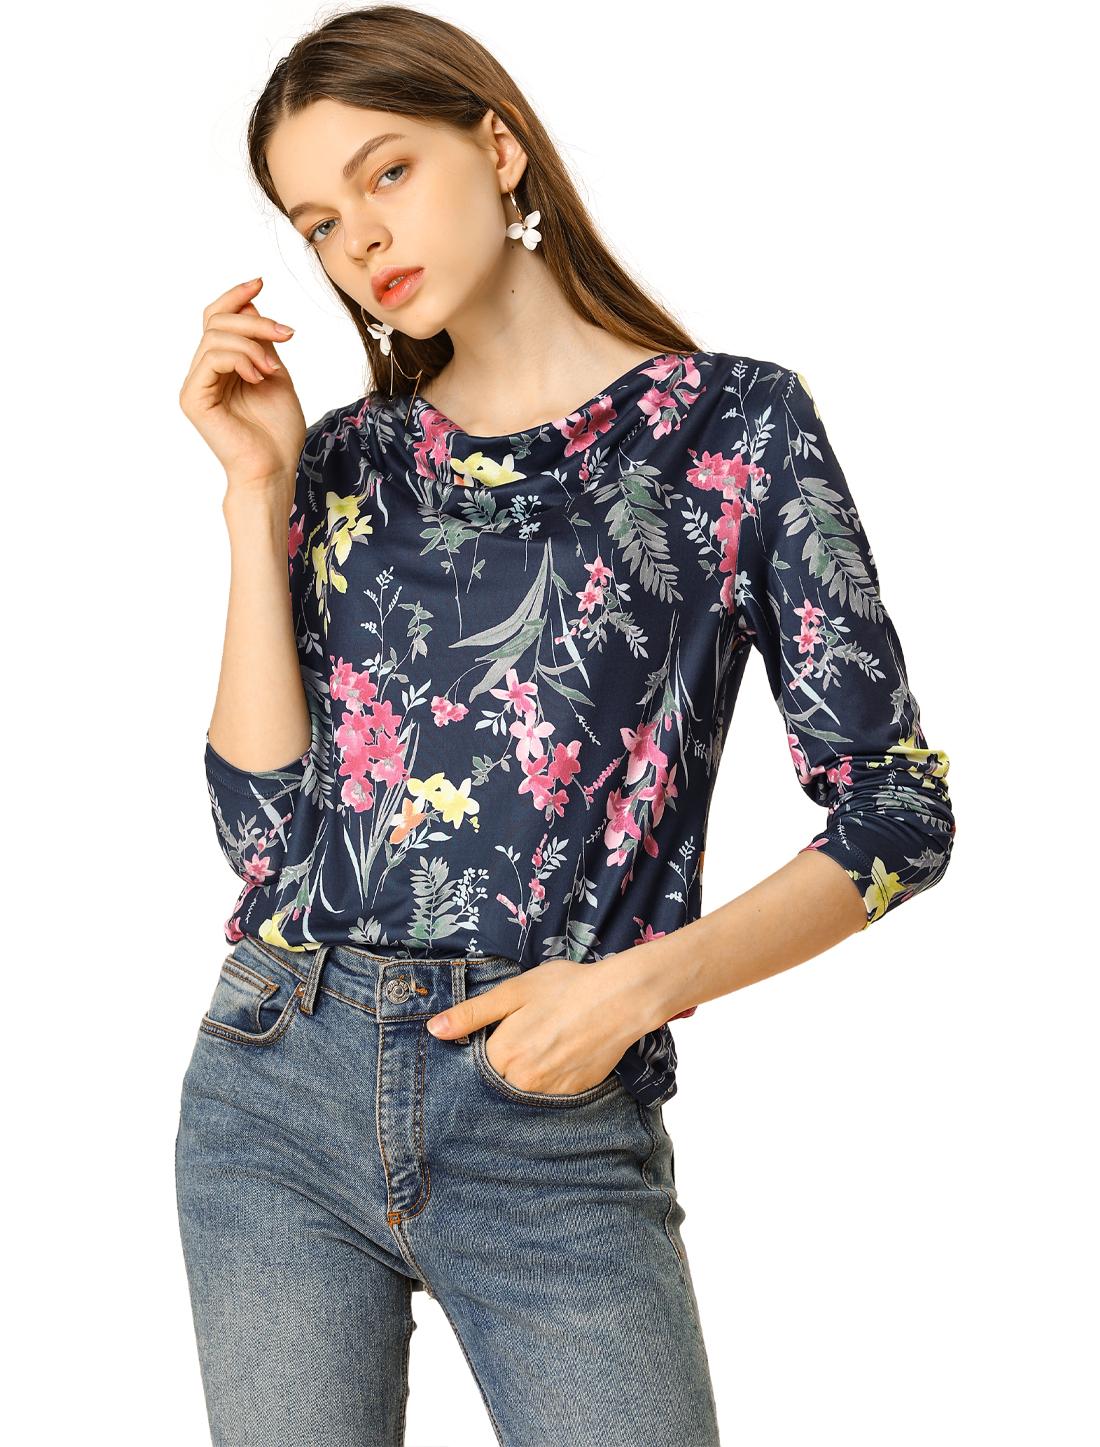 Allegra K Women's Floral Prints Cowl Neck Long Sleeves Top Deep Blue S